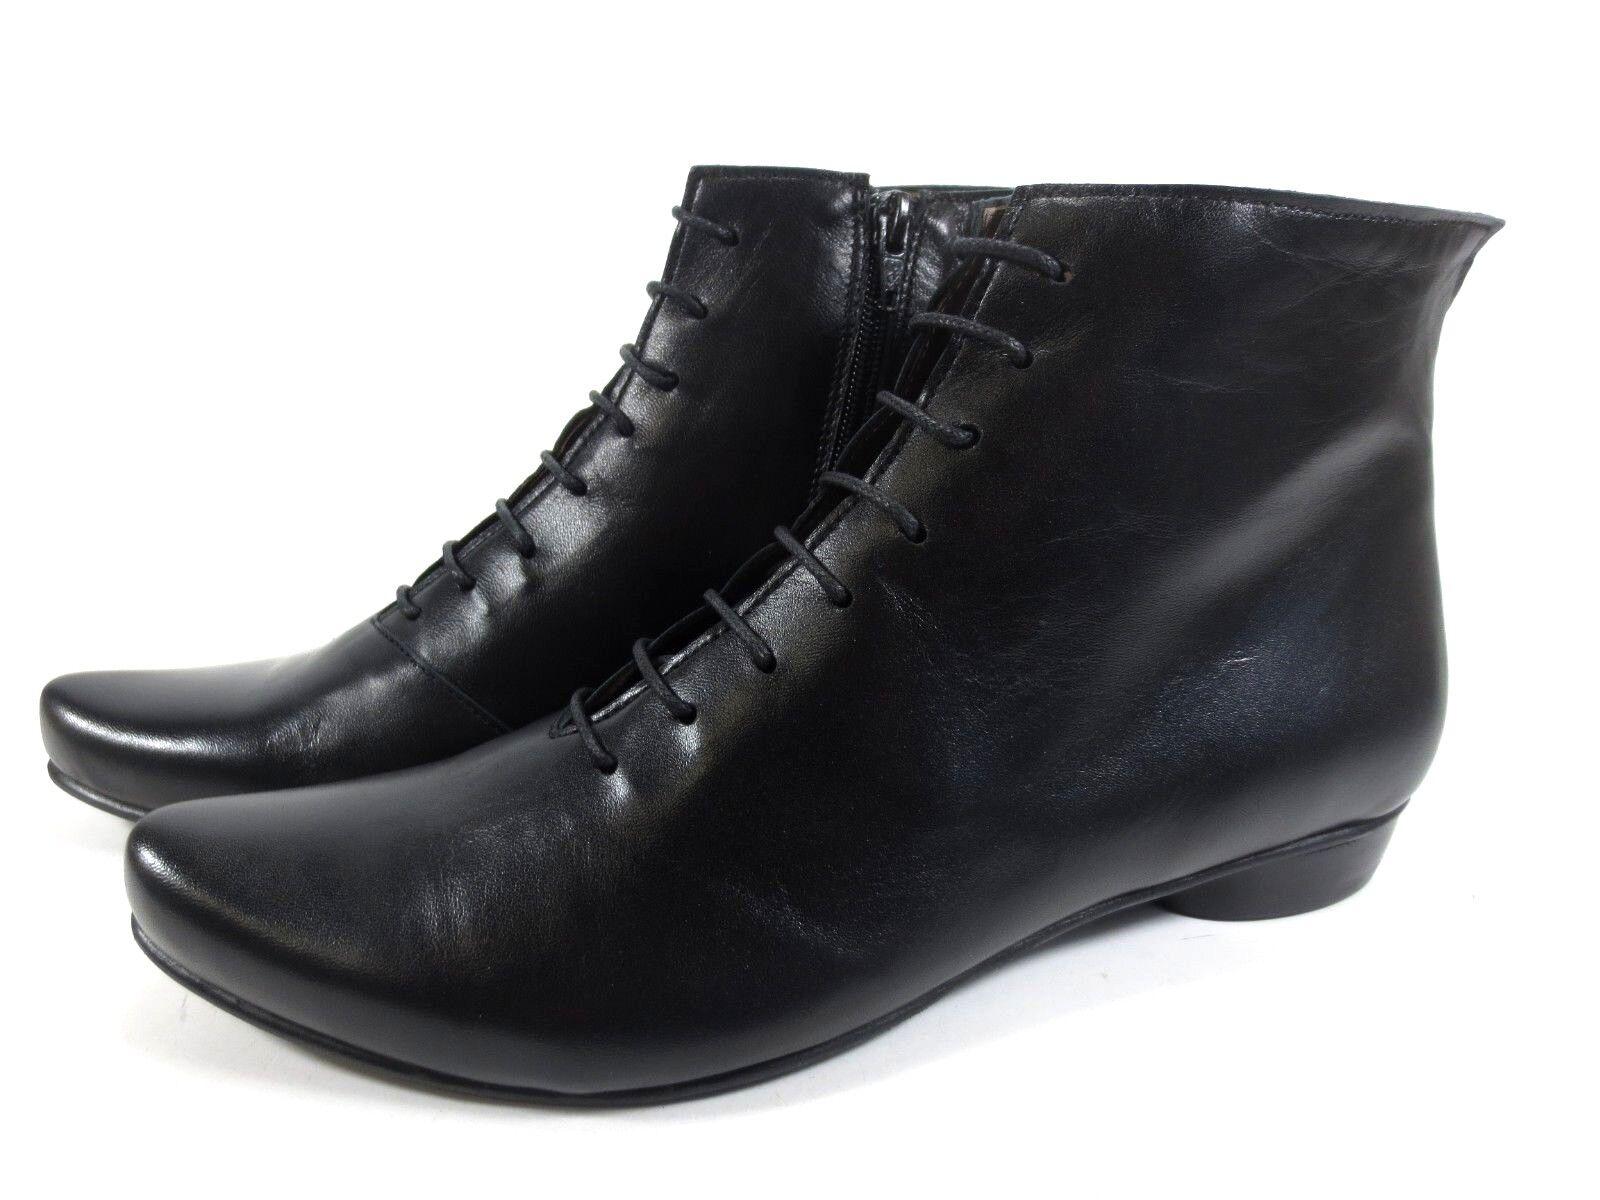 MARIA schuhe feine Nappa Leder Schuhe Stiefeletten Ankle Stiefel Gr. 41 NEU